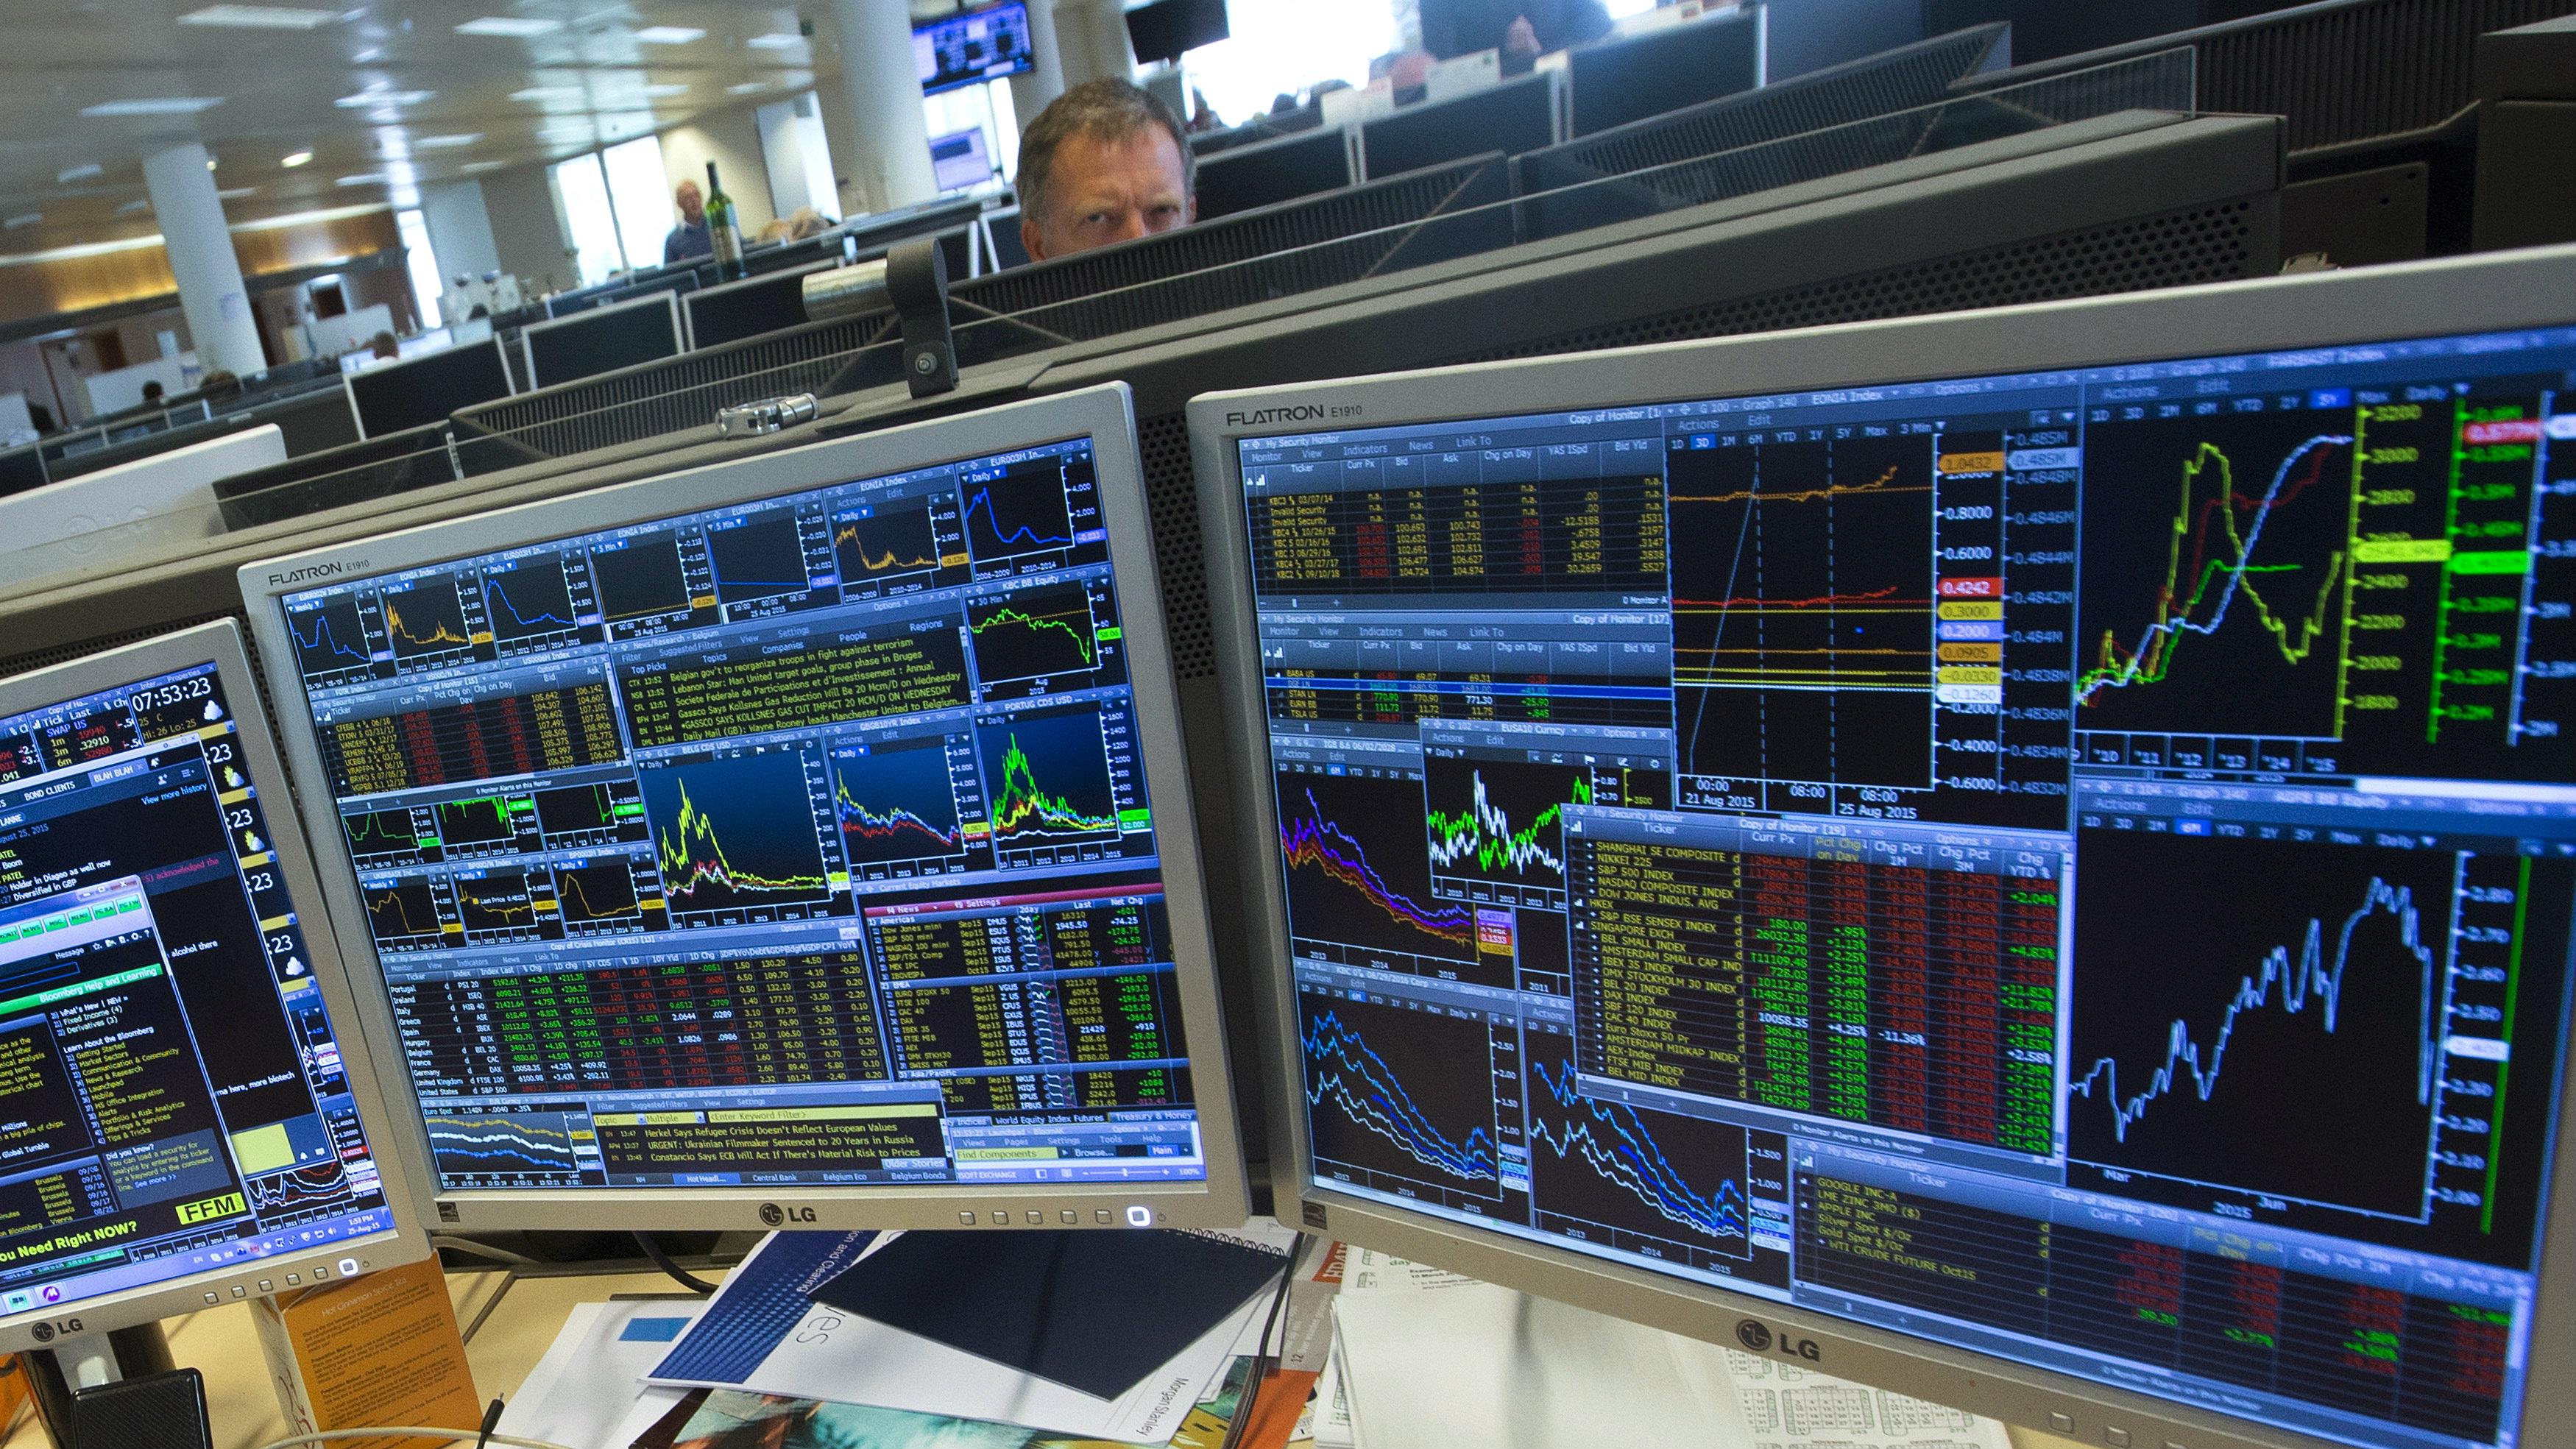 Seth Golden trades volatility ETFs like $XIV and $SVXY for a living